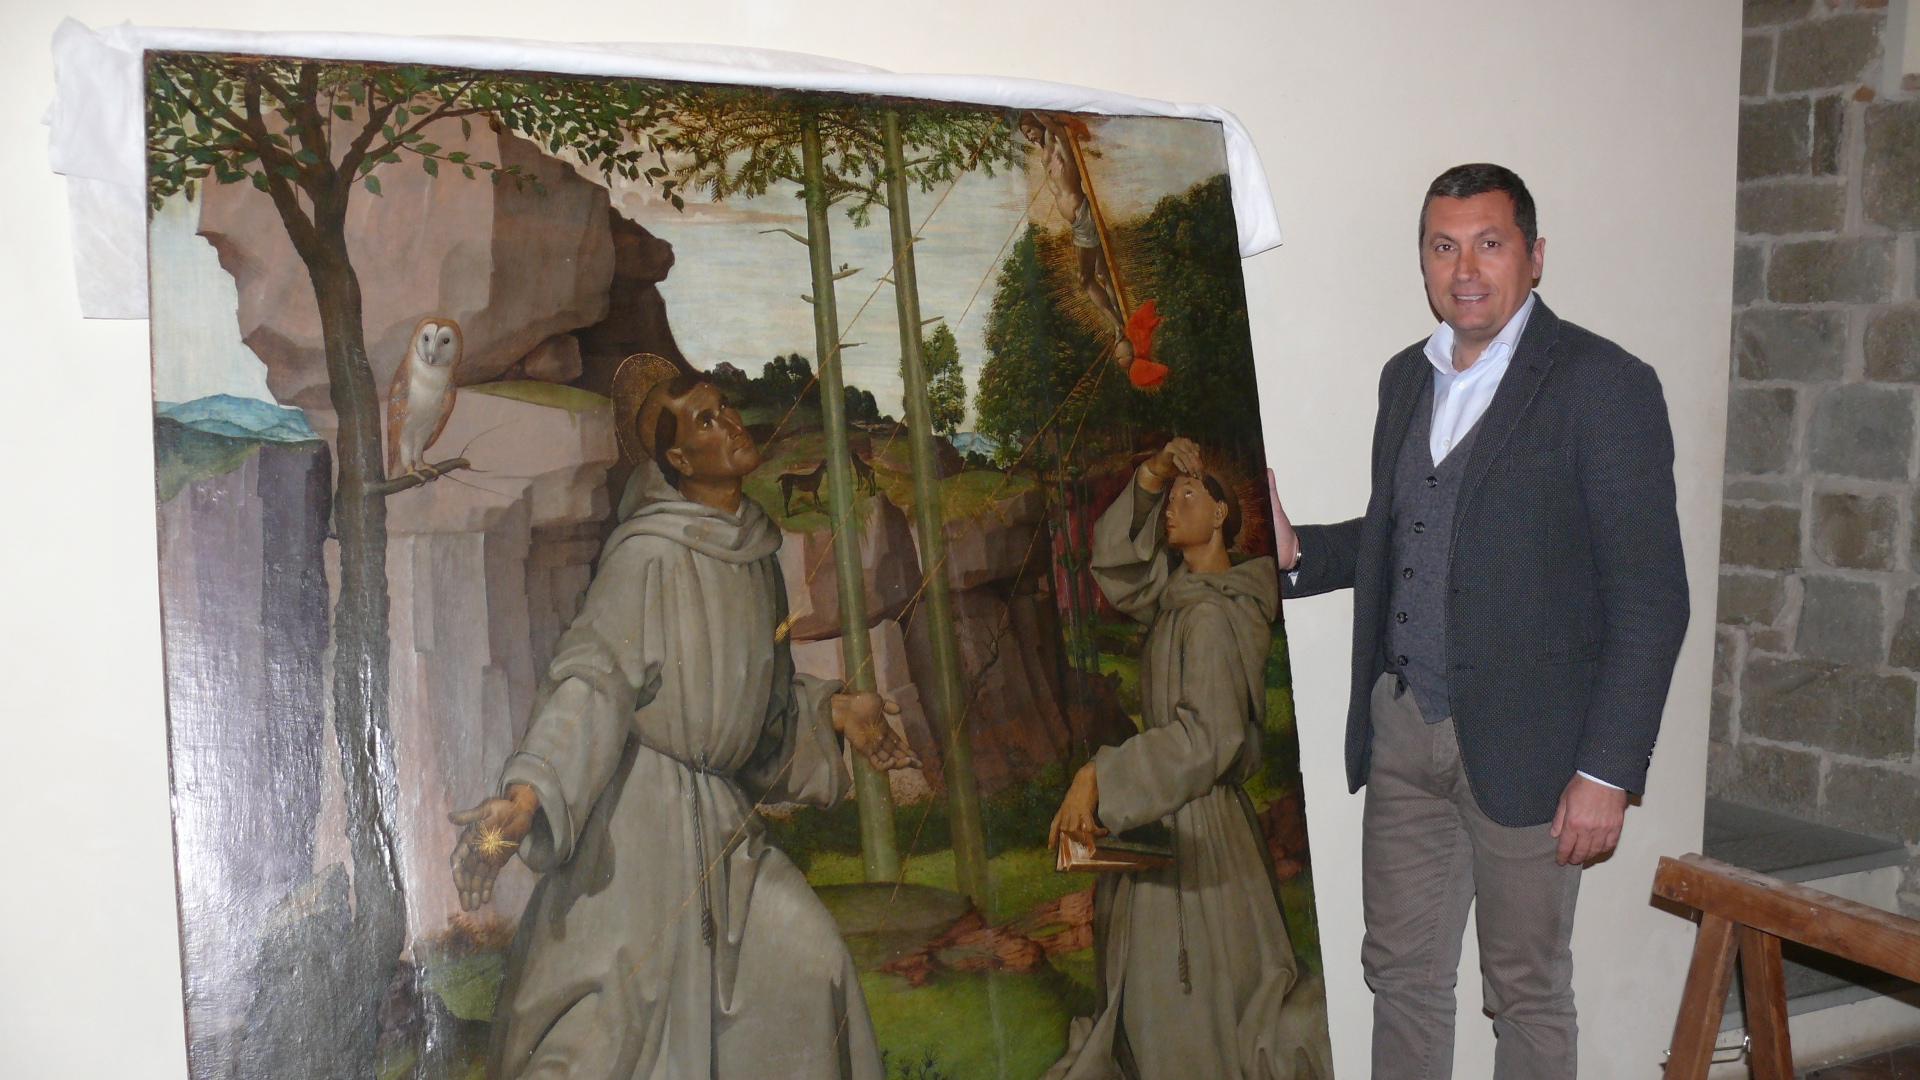 Due 'tesori' di Castiglion Fiorentino in mostra a Firenze